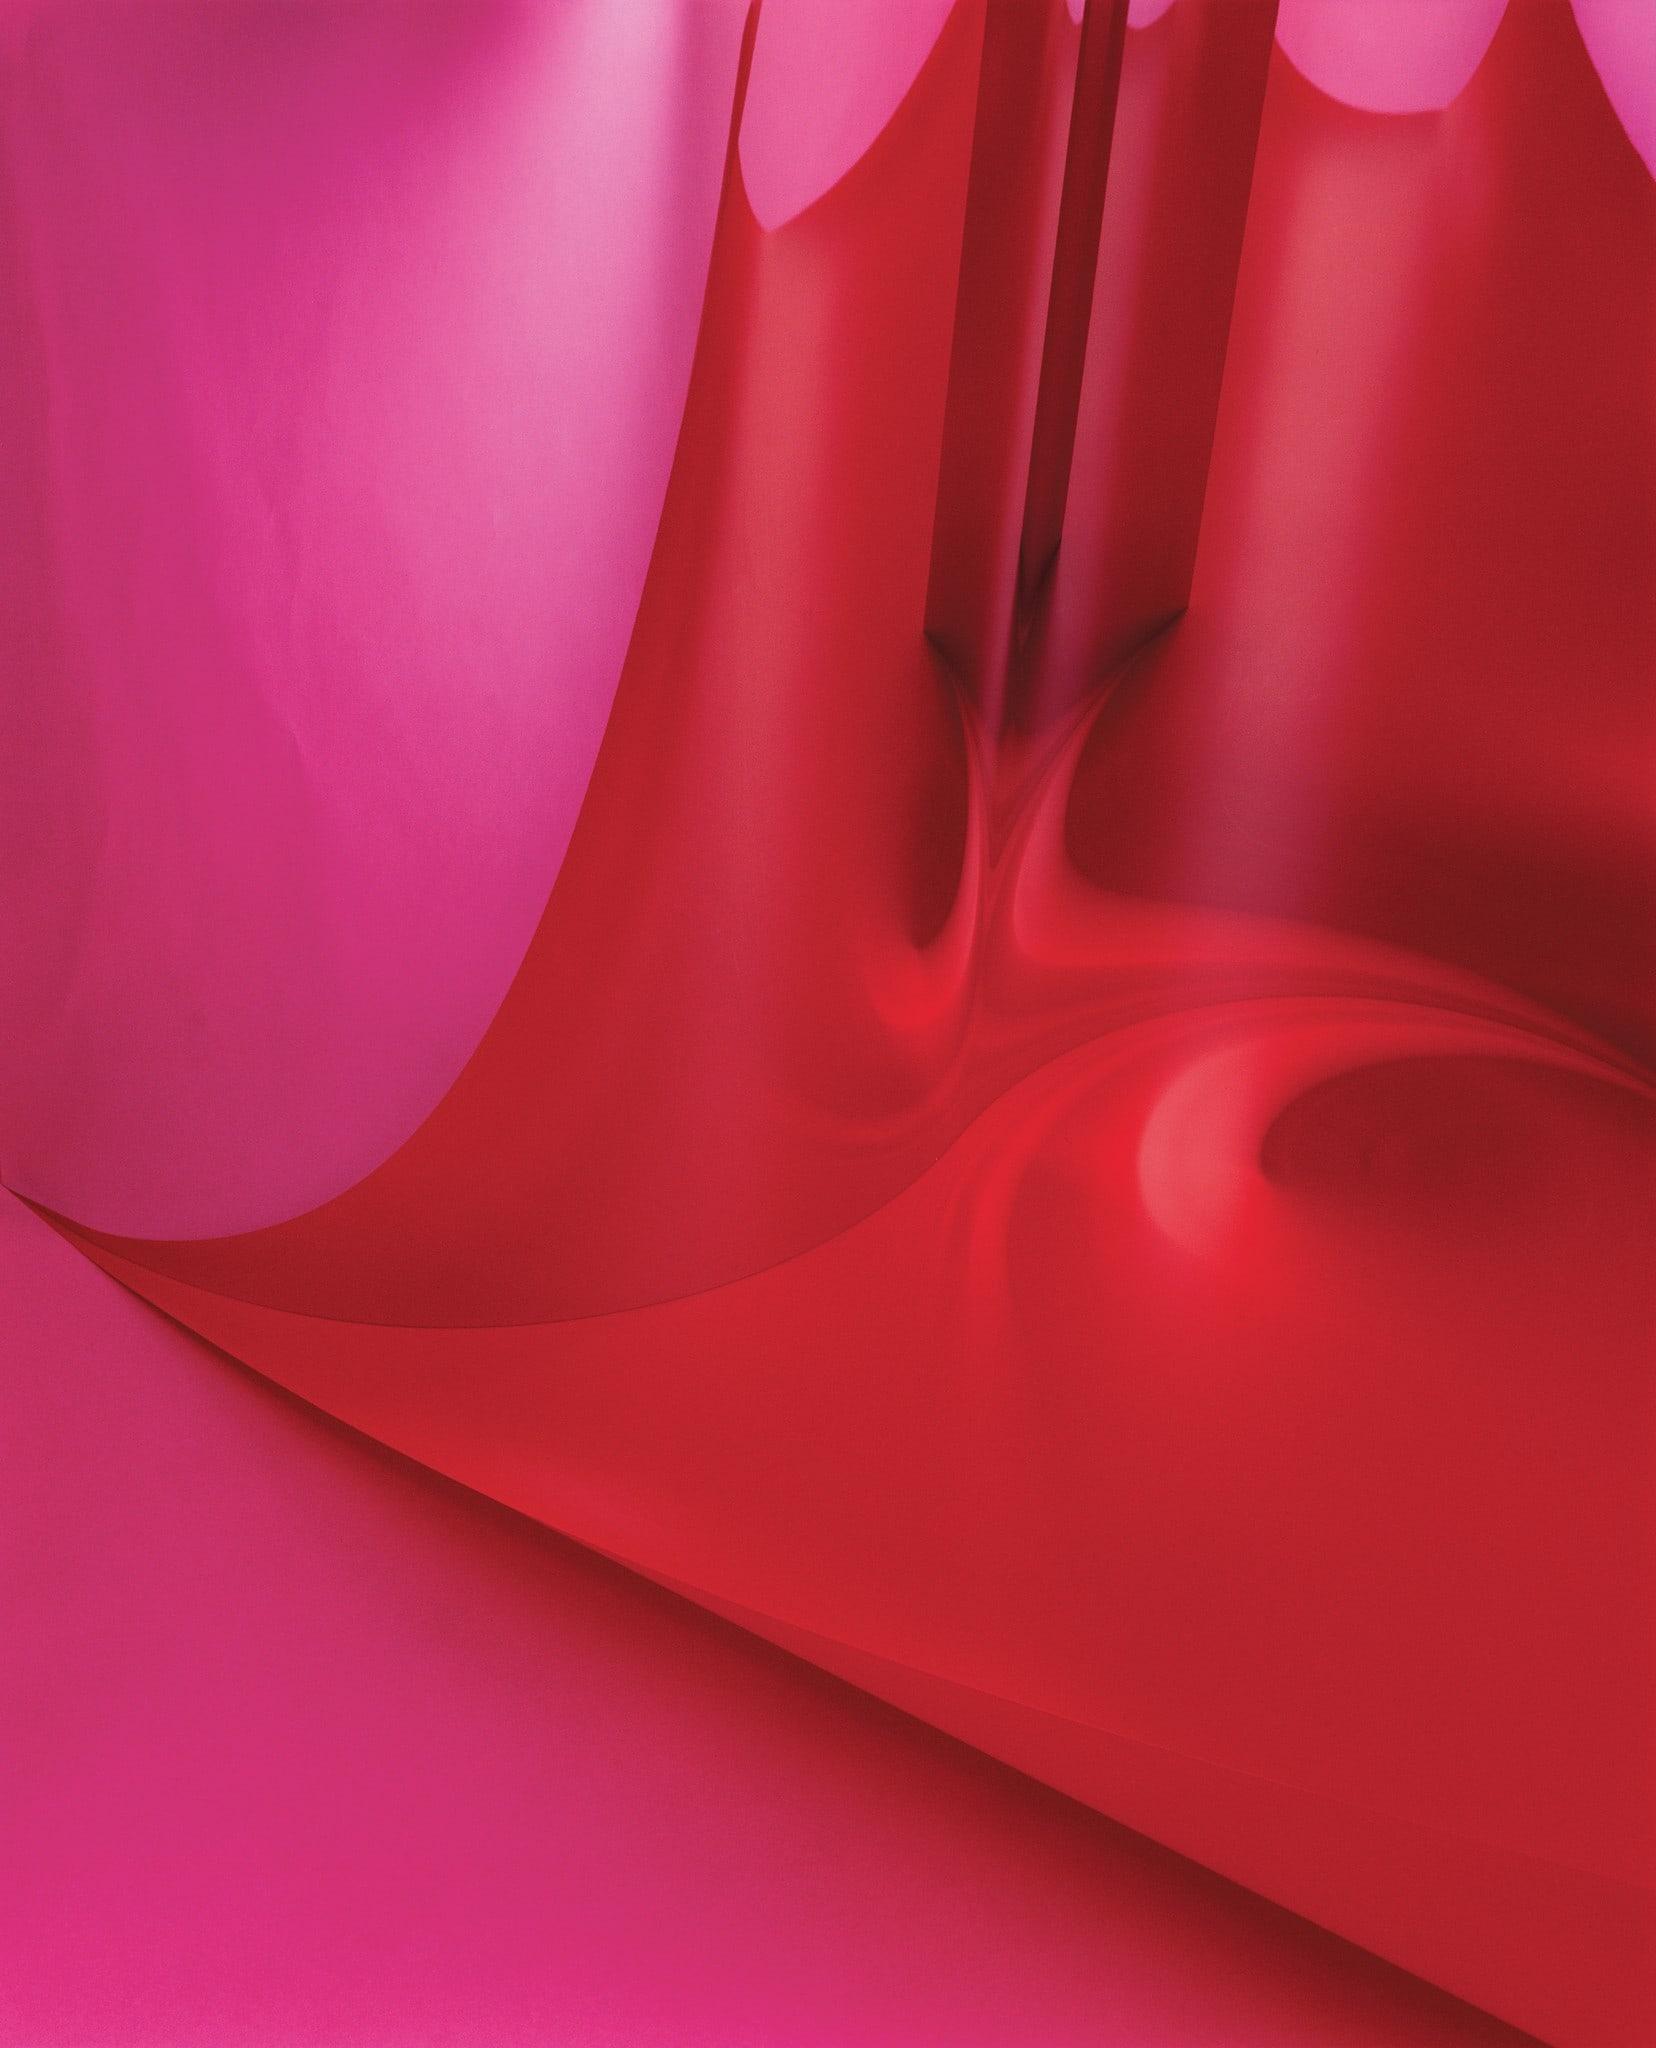 Rot-Pink-01 by Shirana Shahbazi